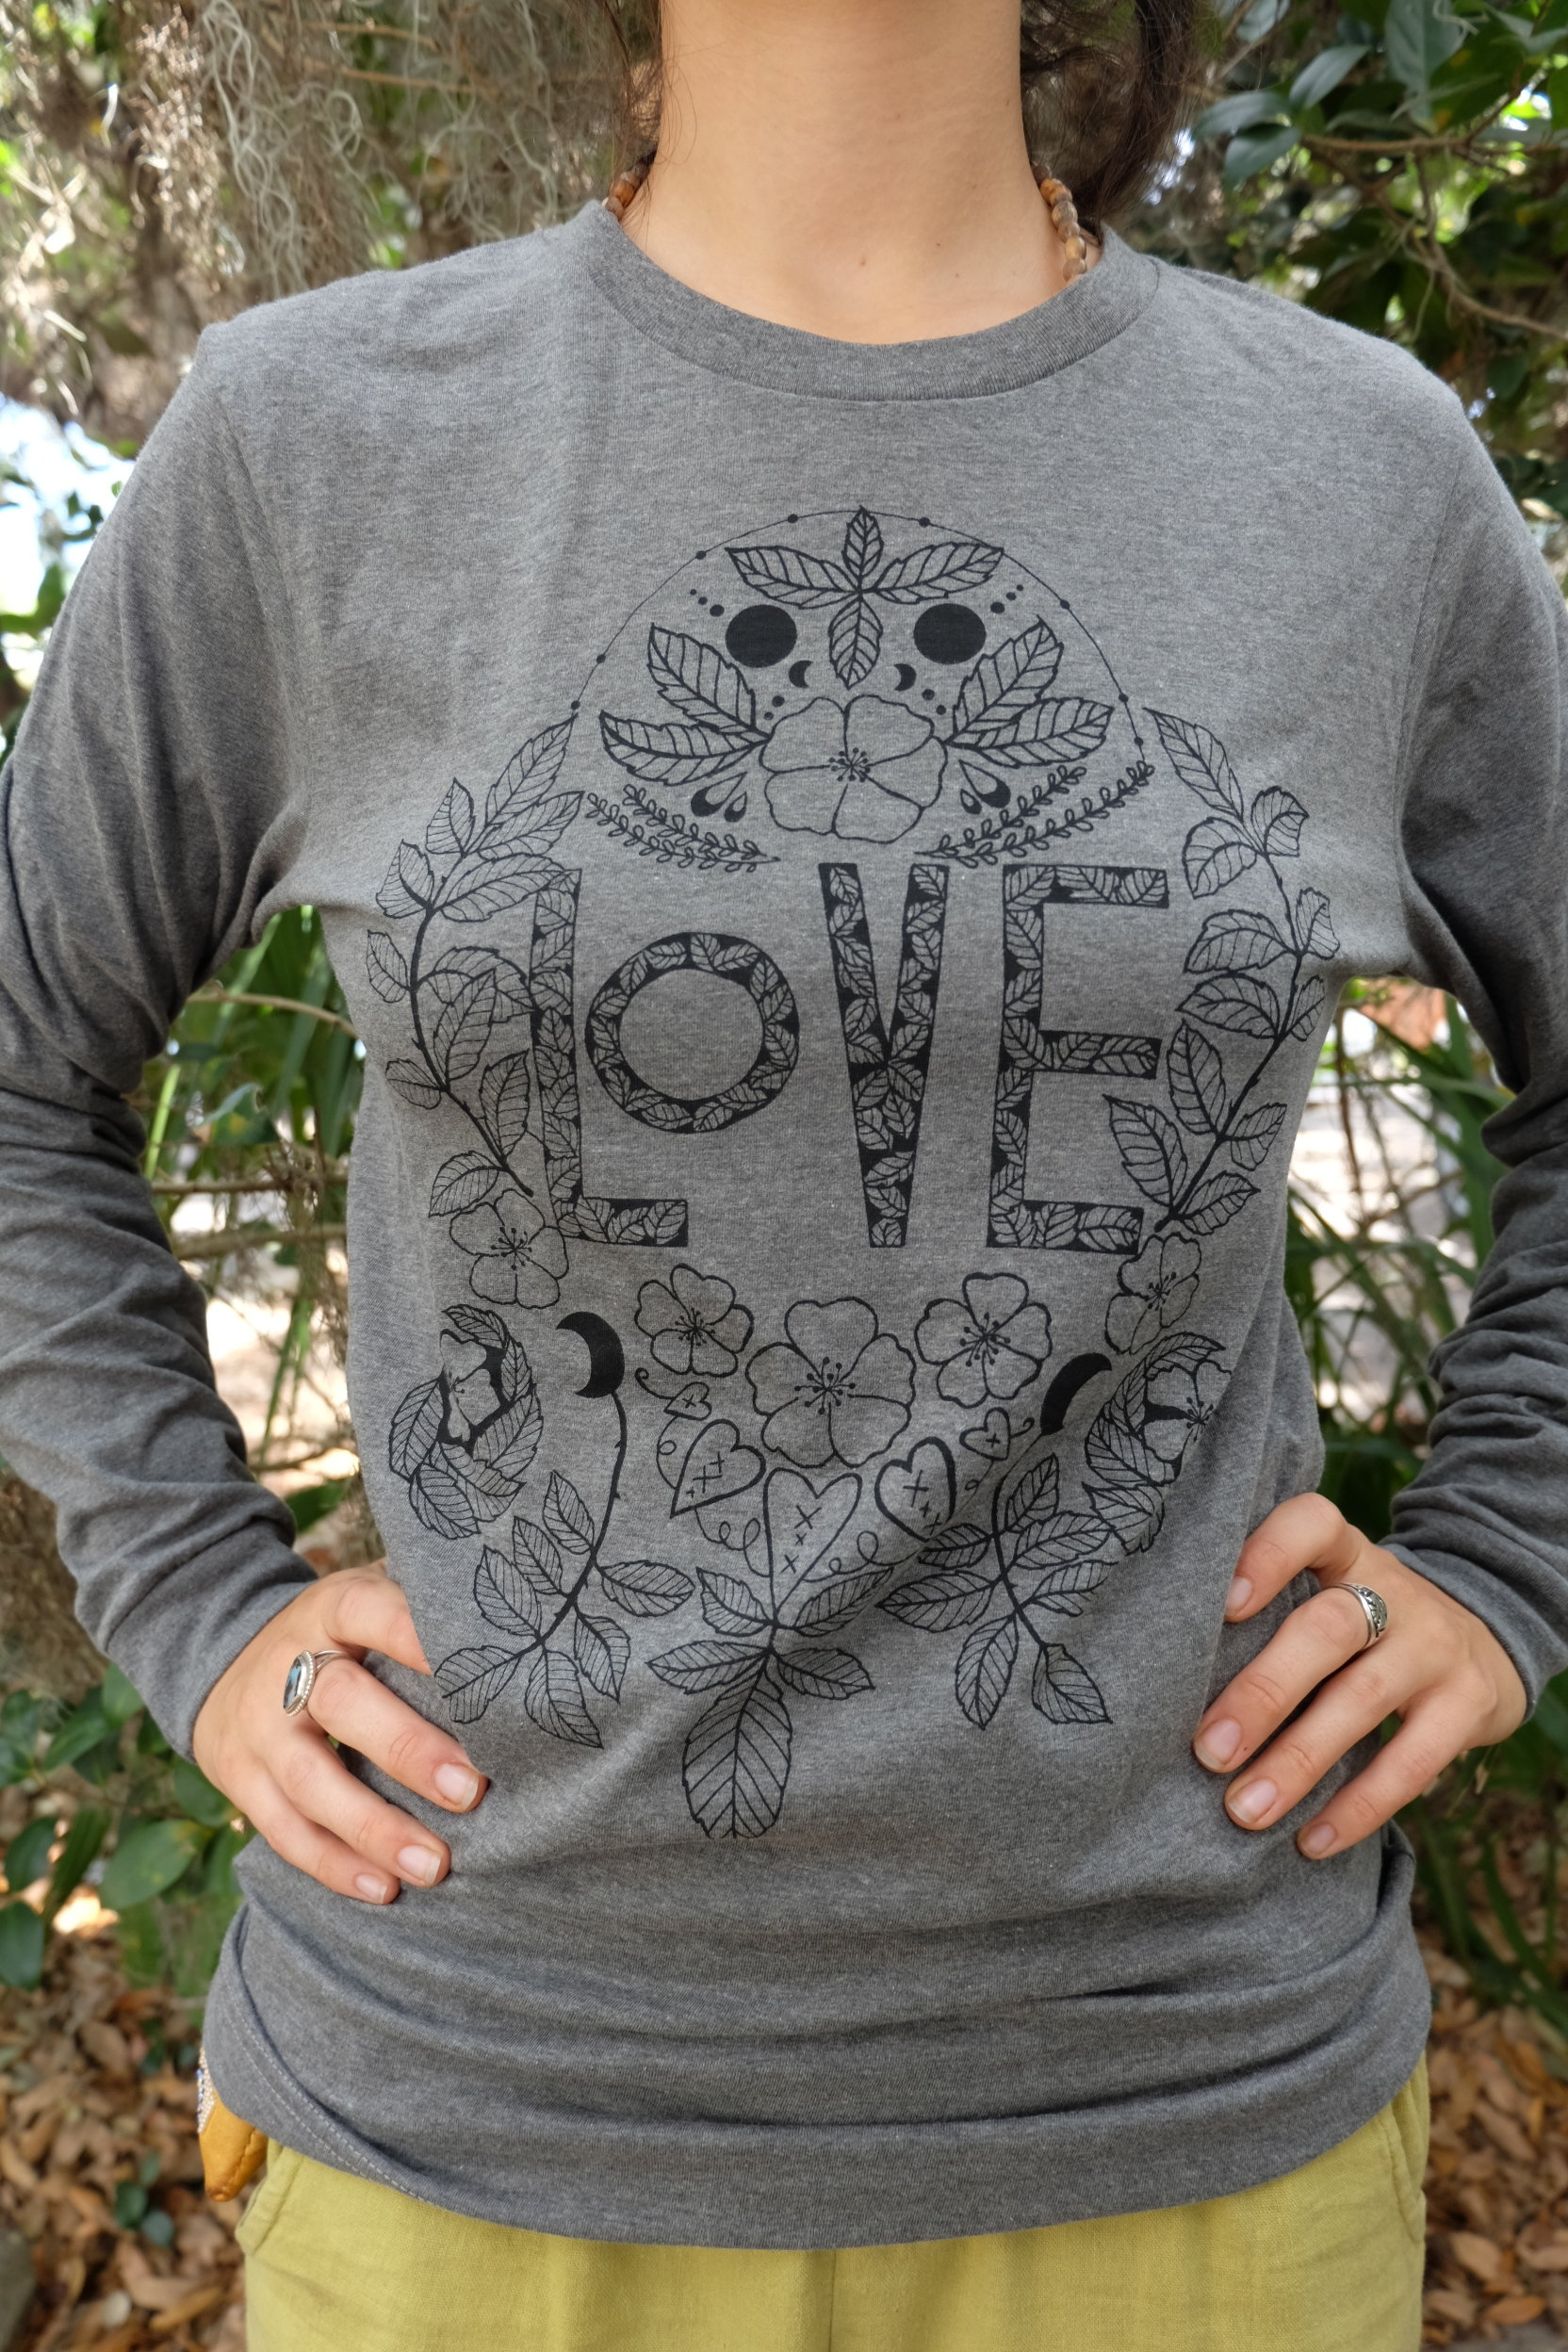 OGCP Unisex Long Sleeved Tee - Love, Wild Rose